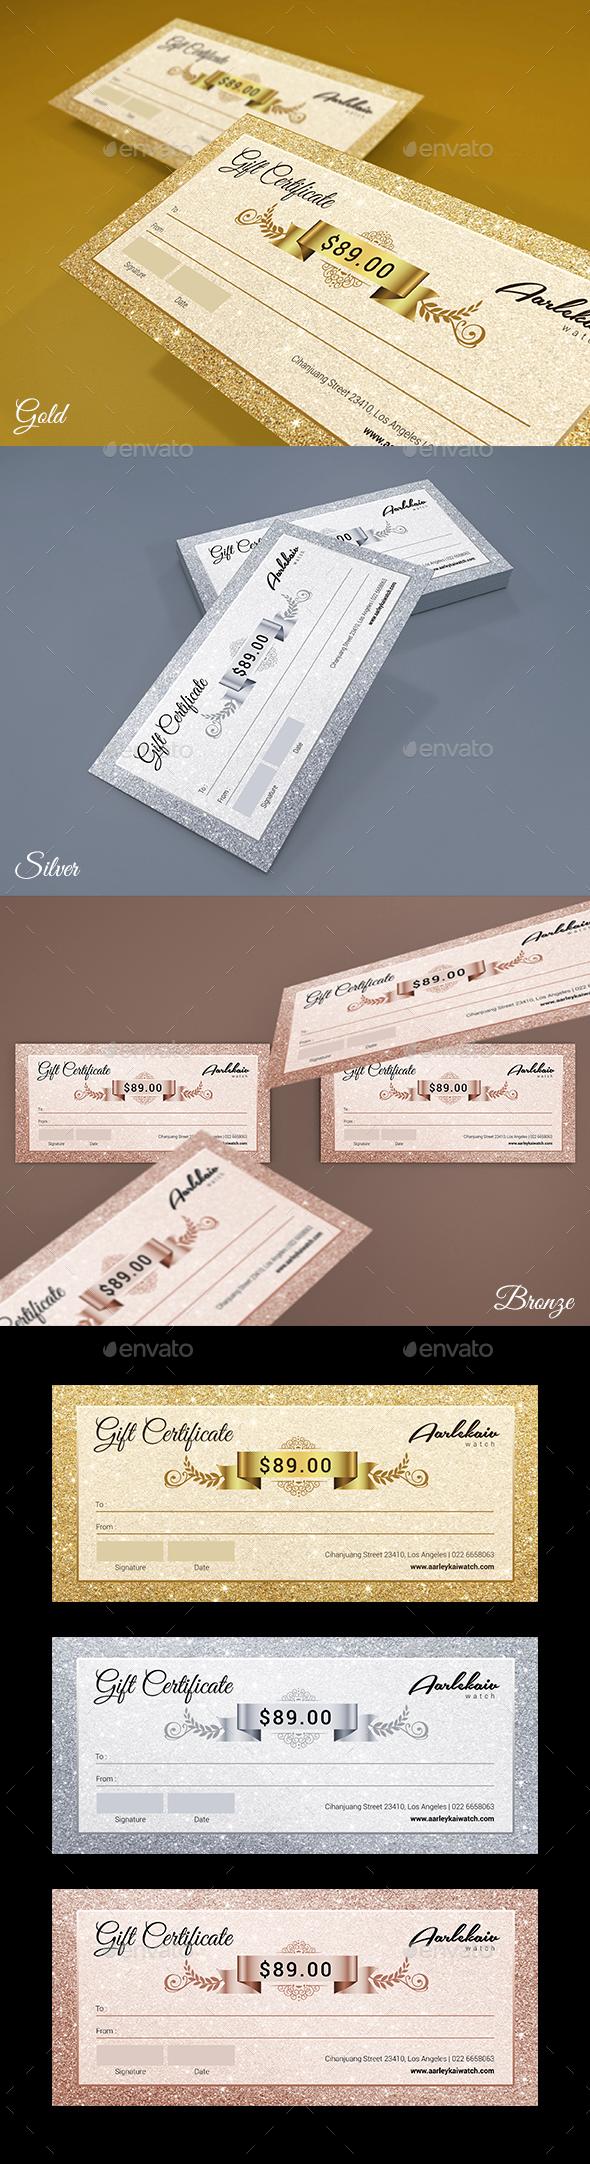 Elegant Gift Certificate